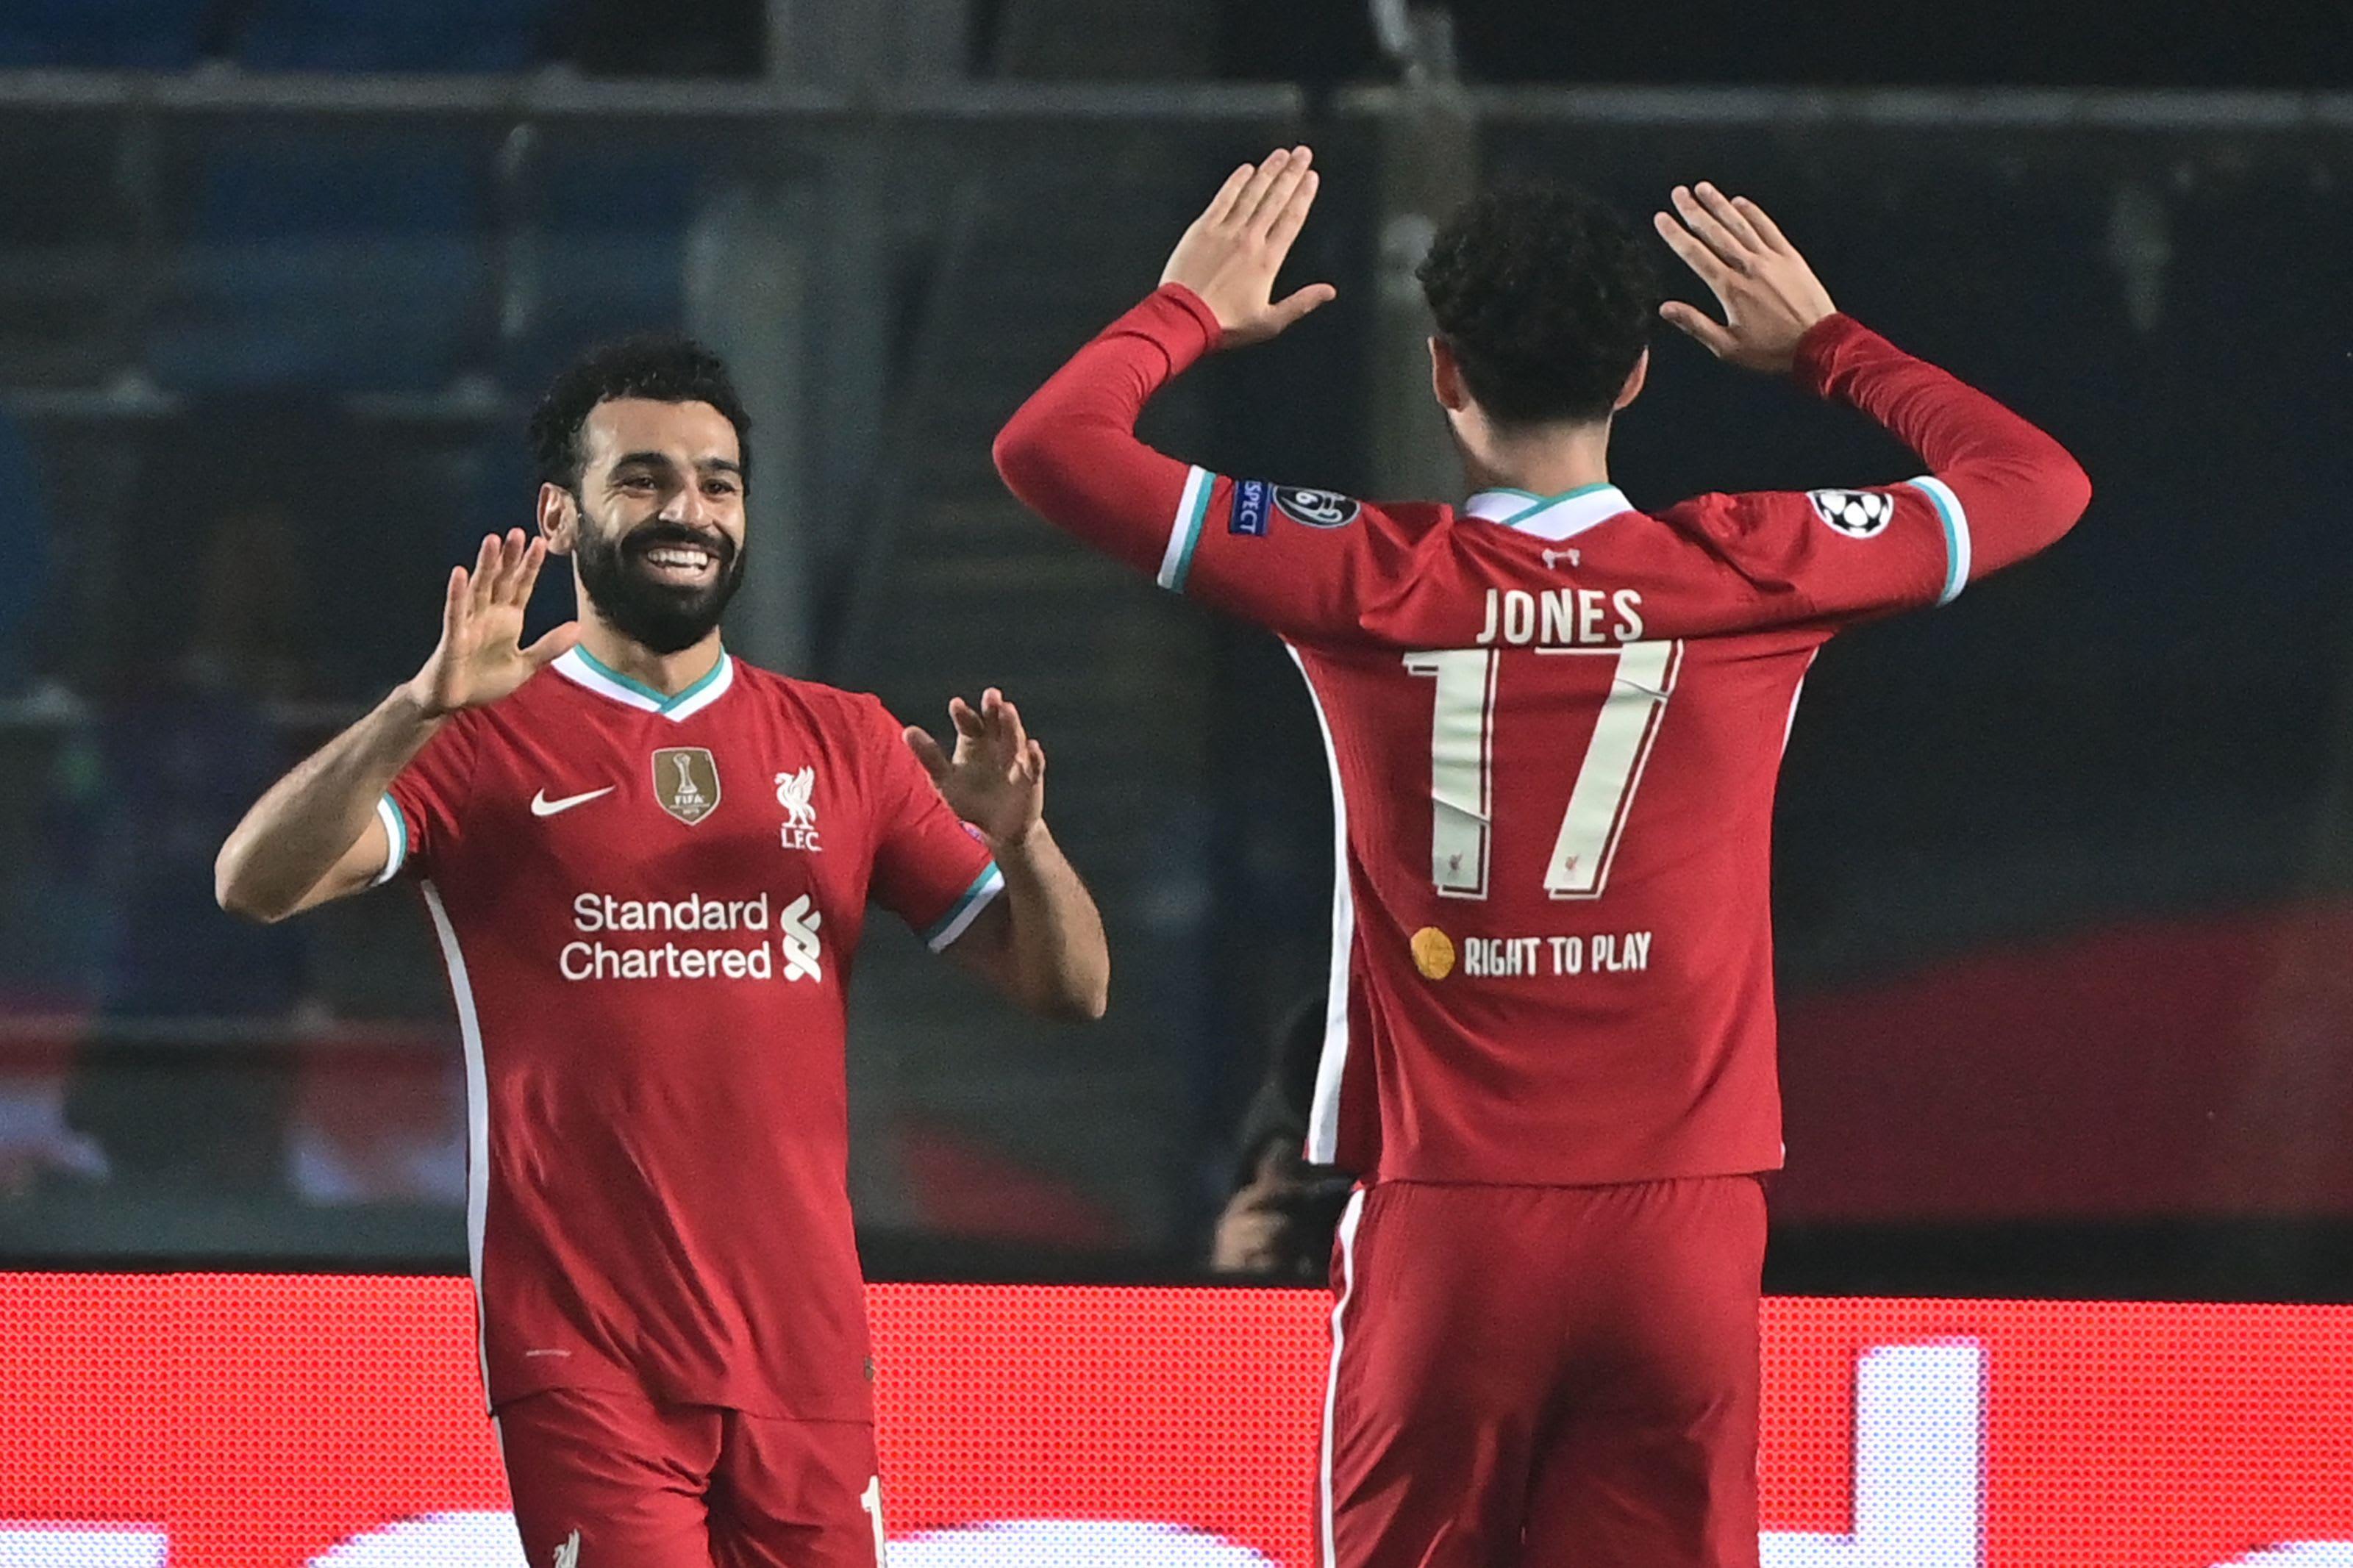 Liverpool, Mohamed Salah, Curtis Jones